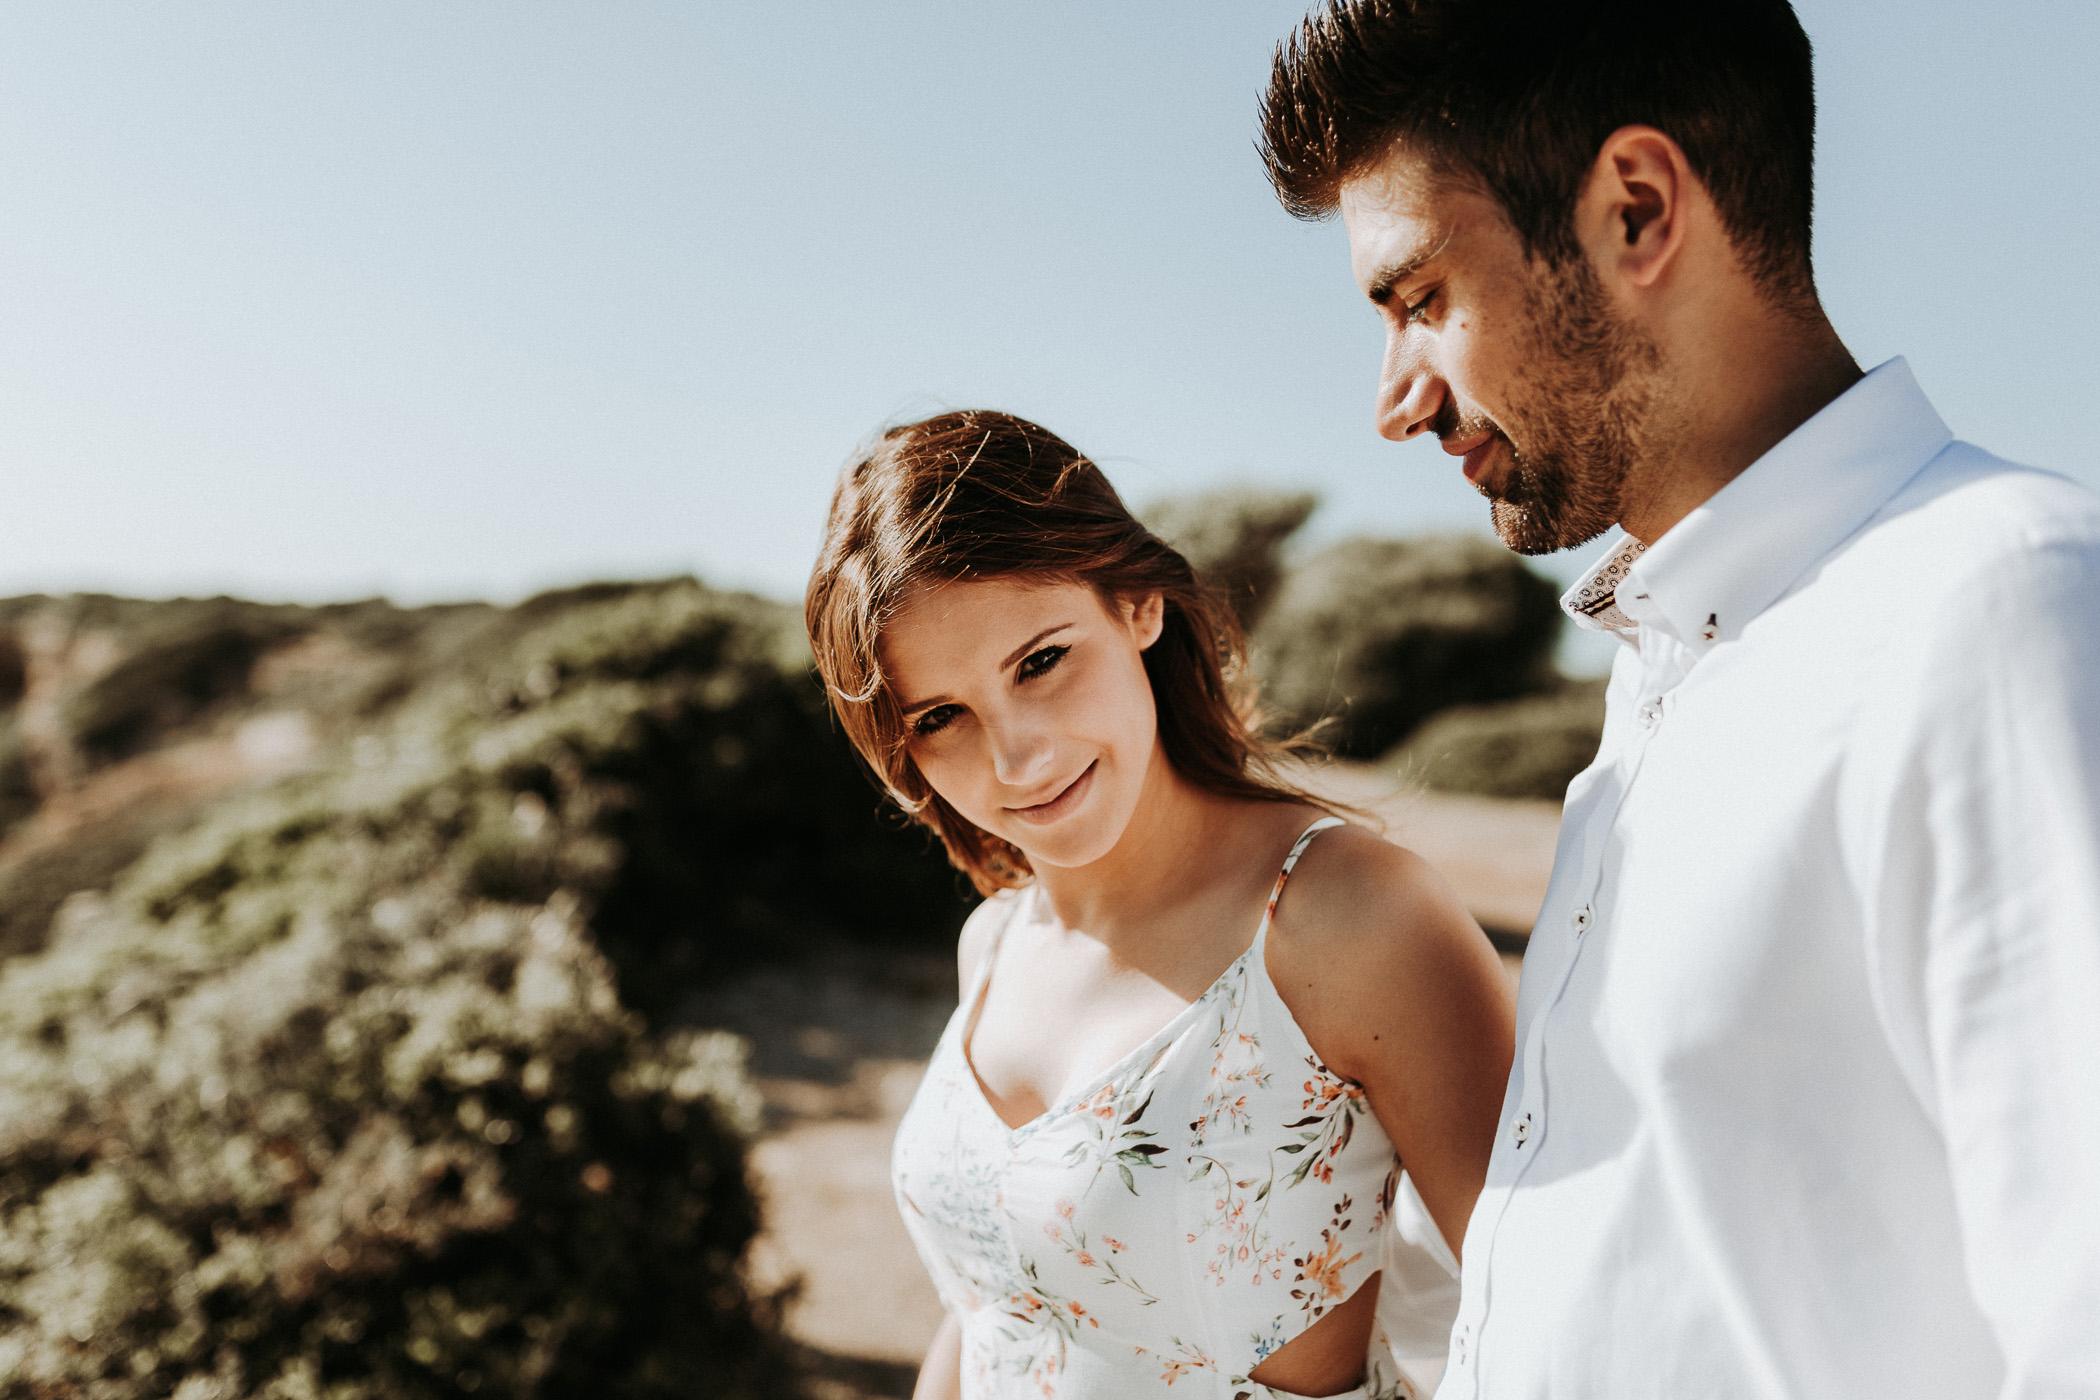 DanielaMarquardtPhotography_wedding_elopement_mallorca_spain_calapi_palma_lauraandtoni_18